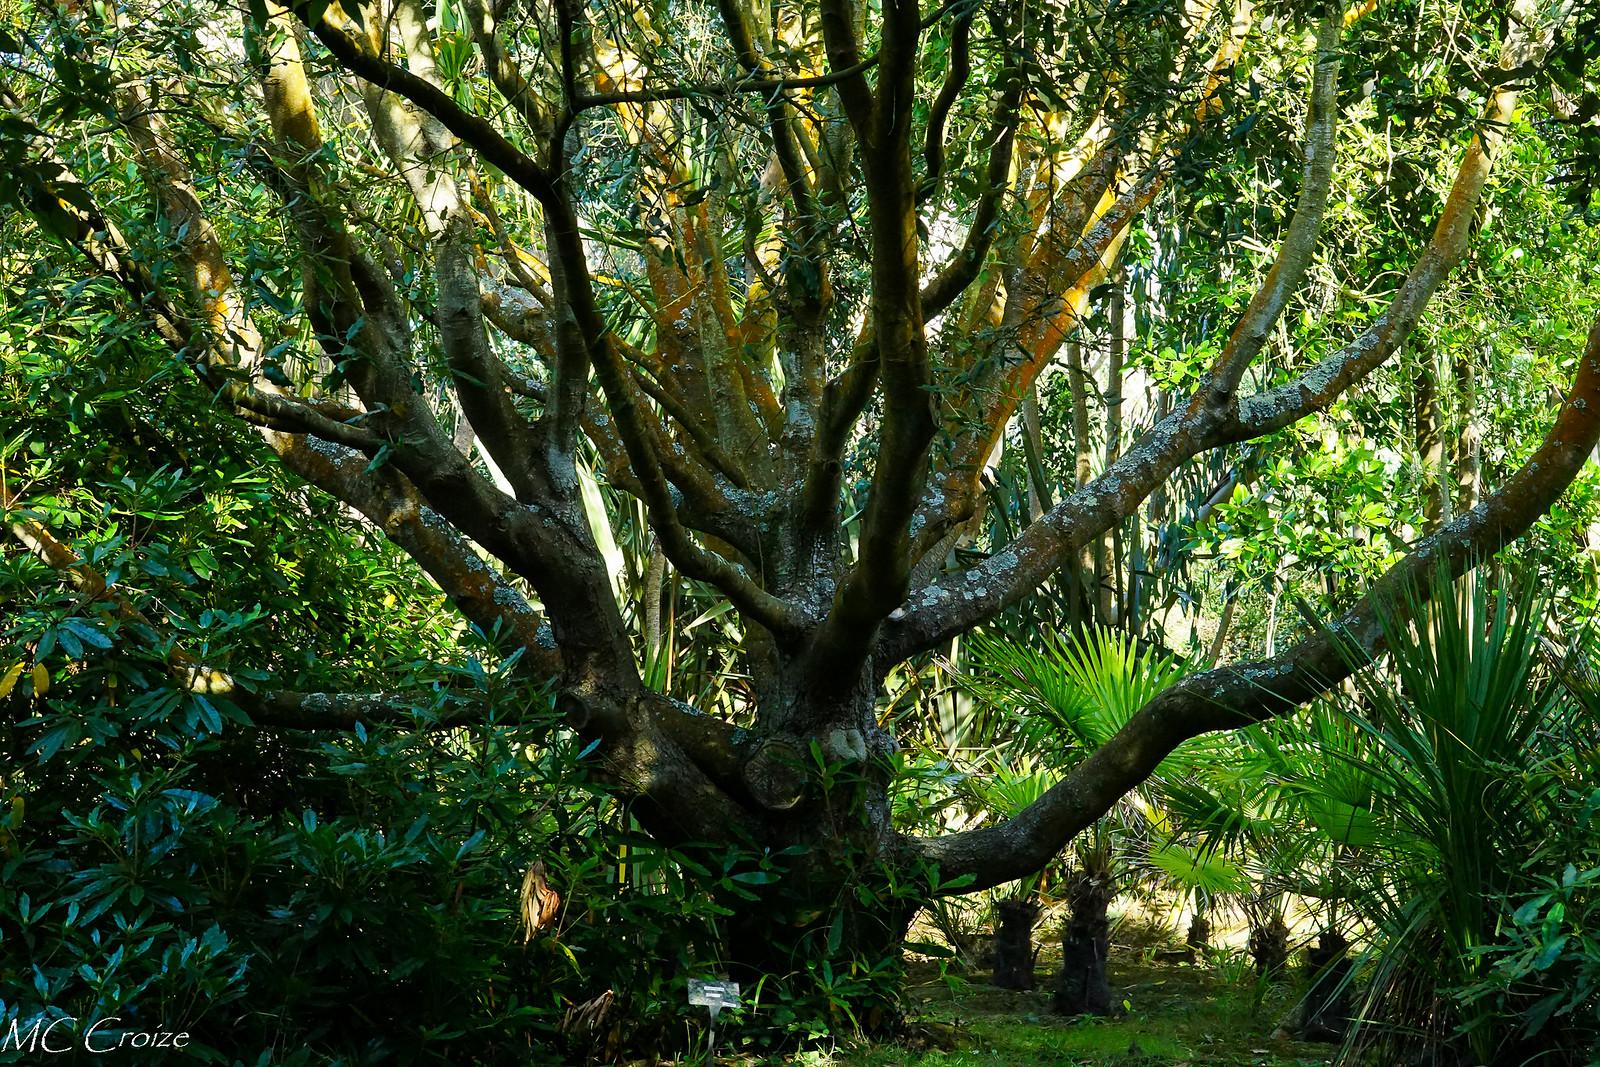 Eucalyptus 43202809150_4ef7a6f0f9_h